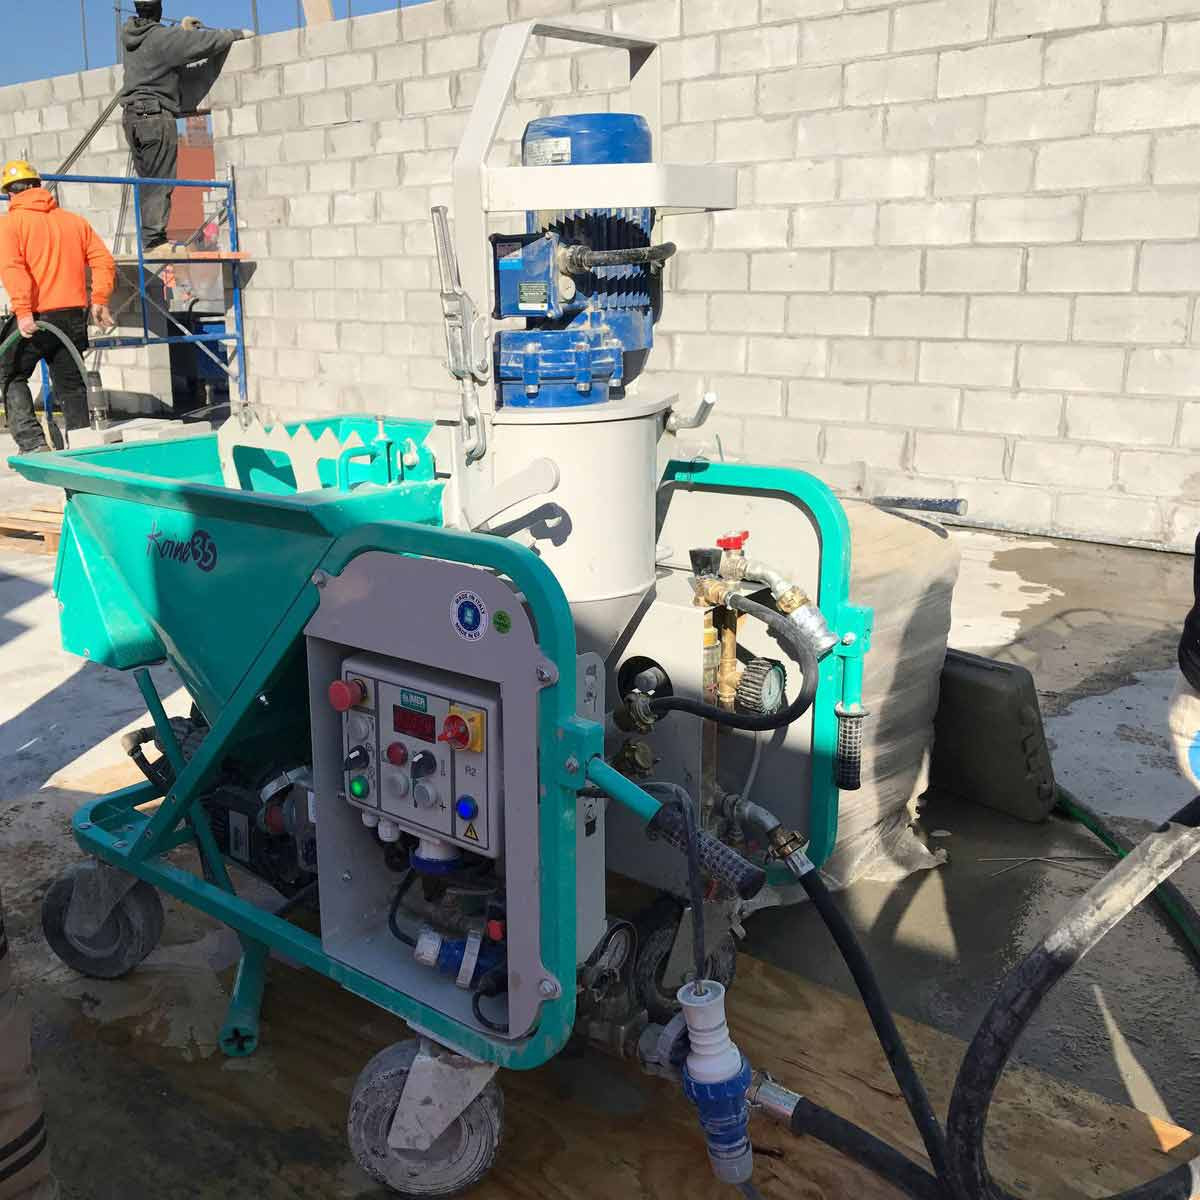 imer koine 35 Mixer Pump job site